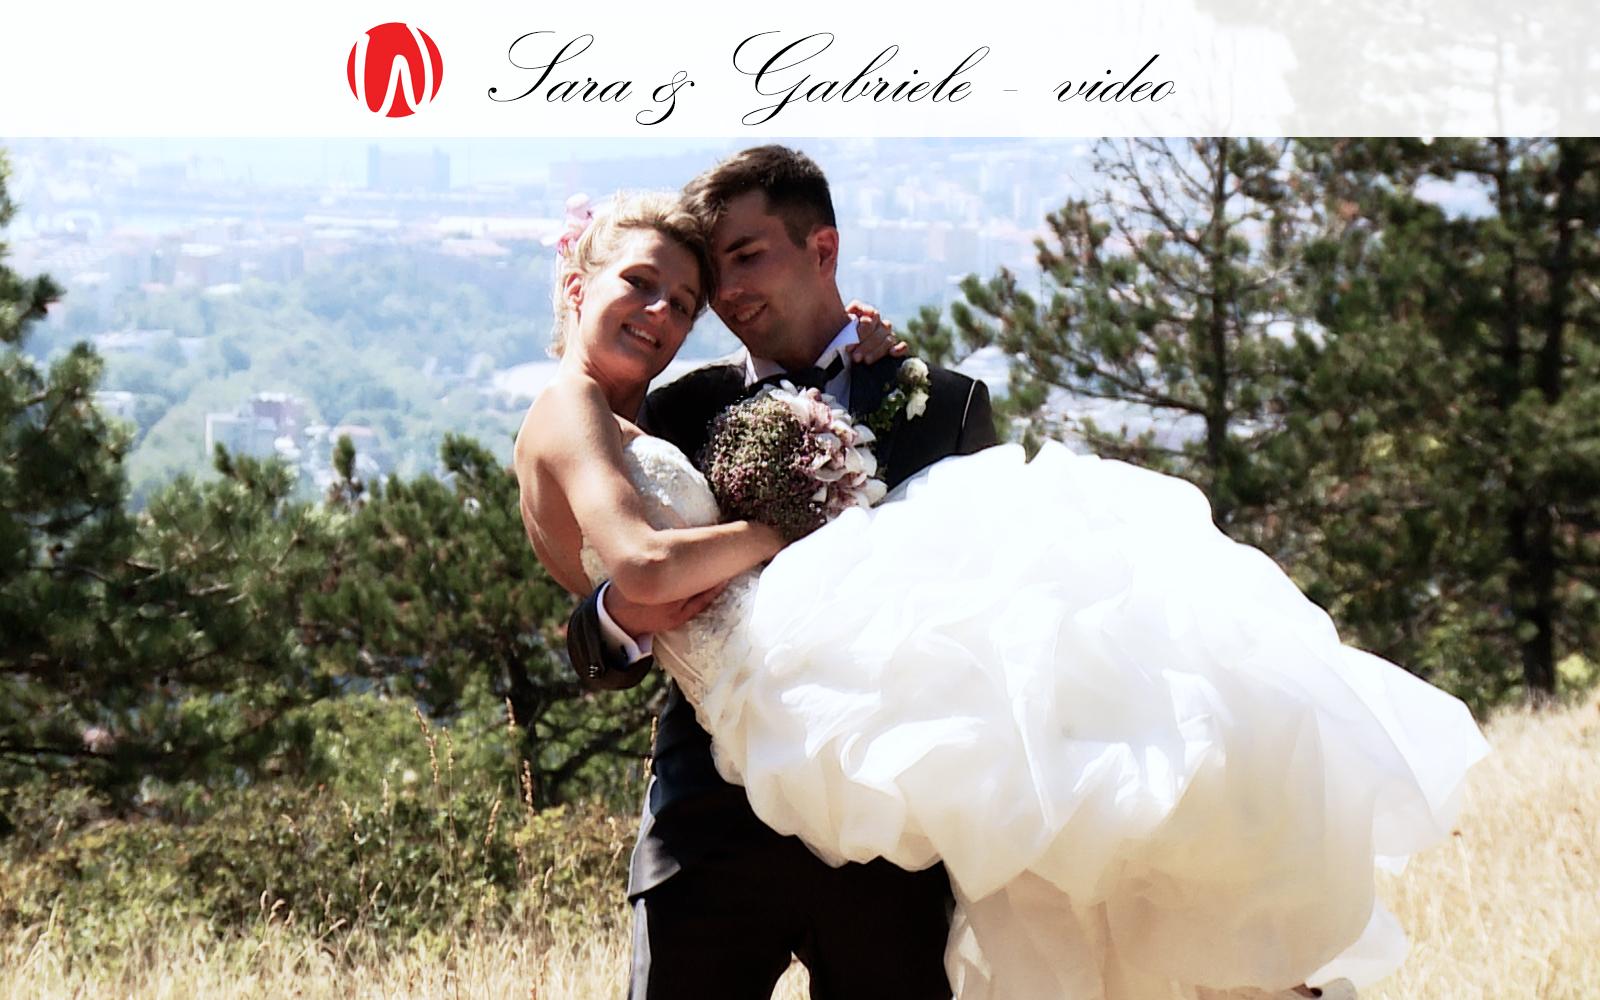 Sara & Gabriele